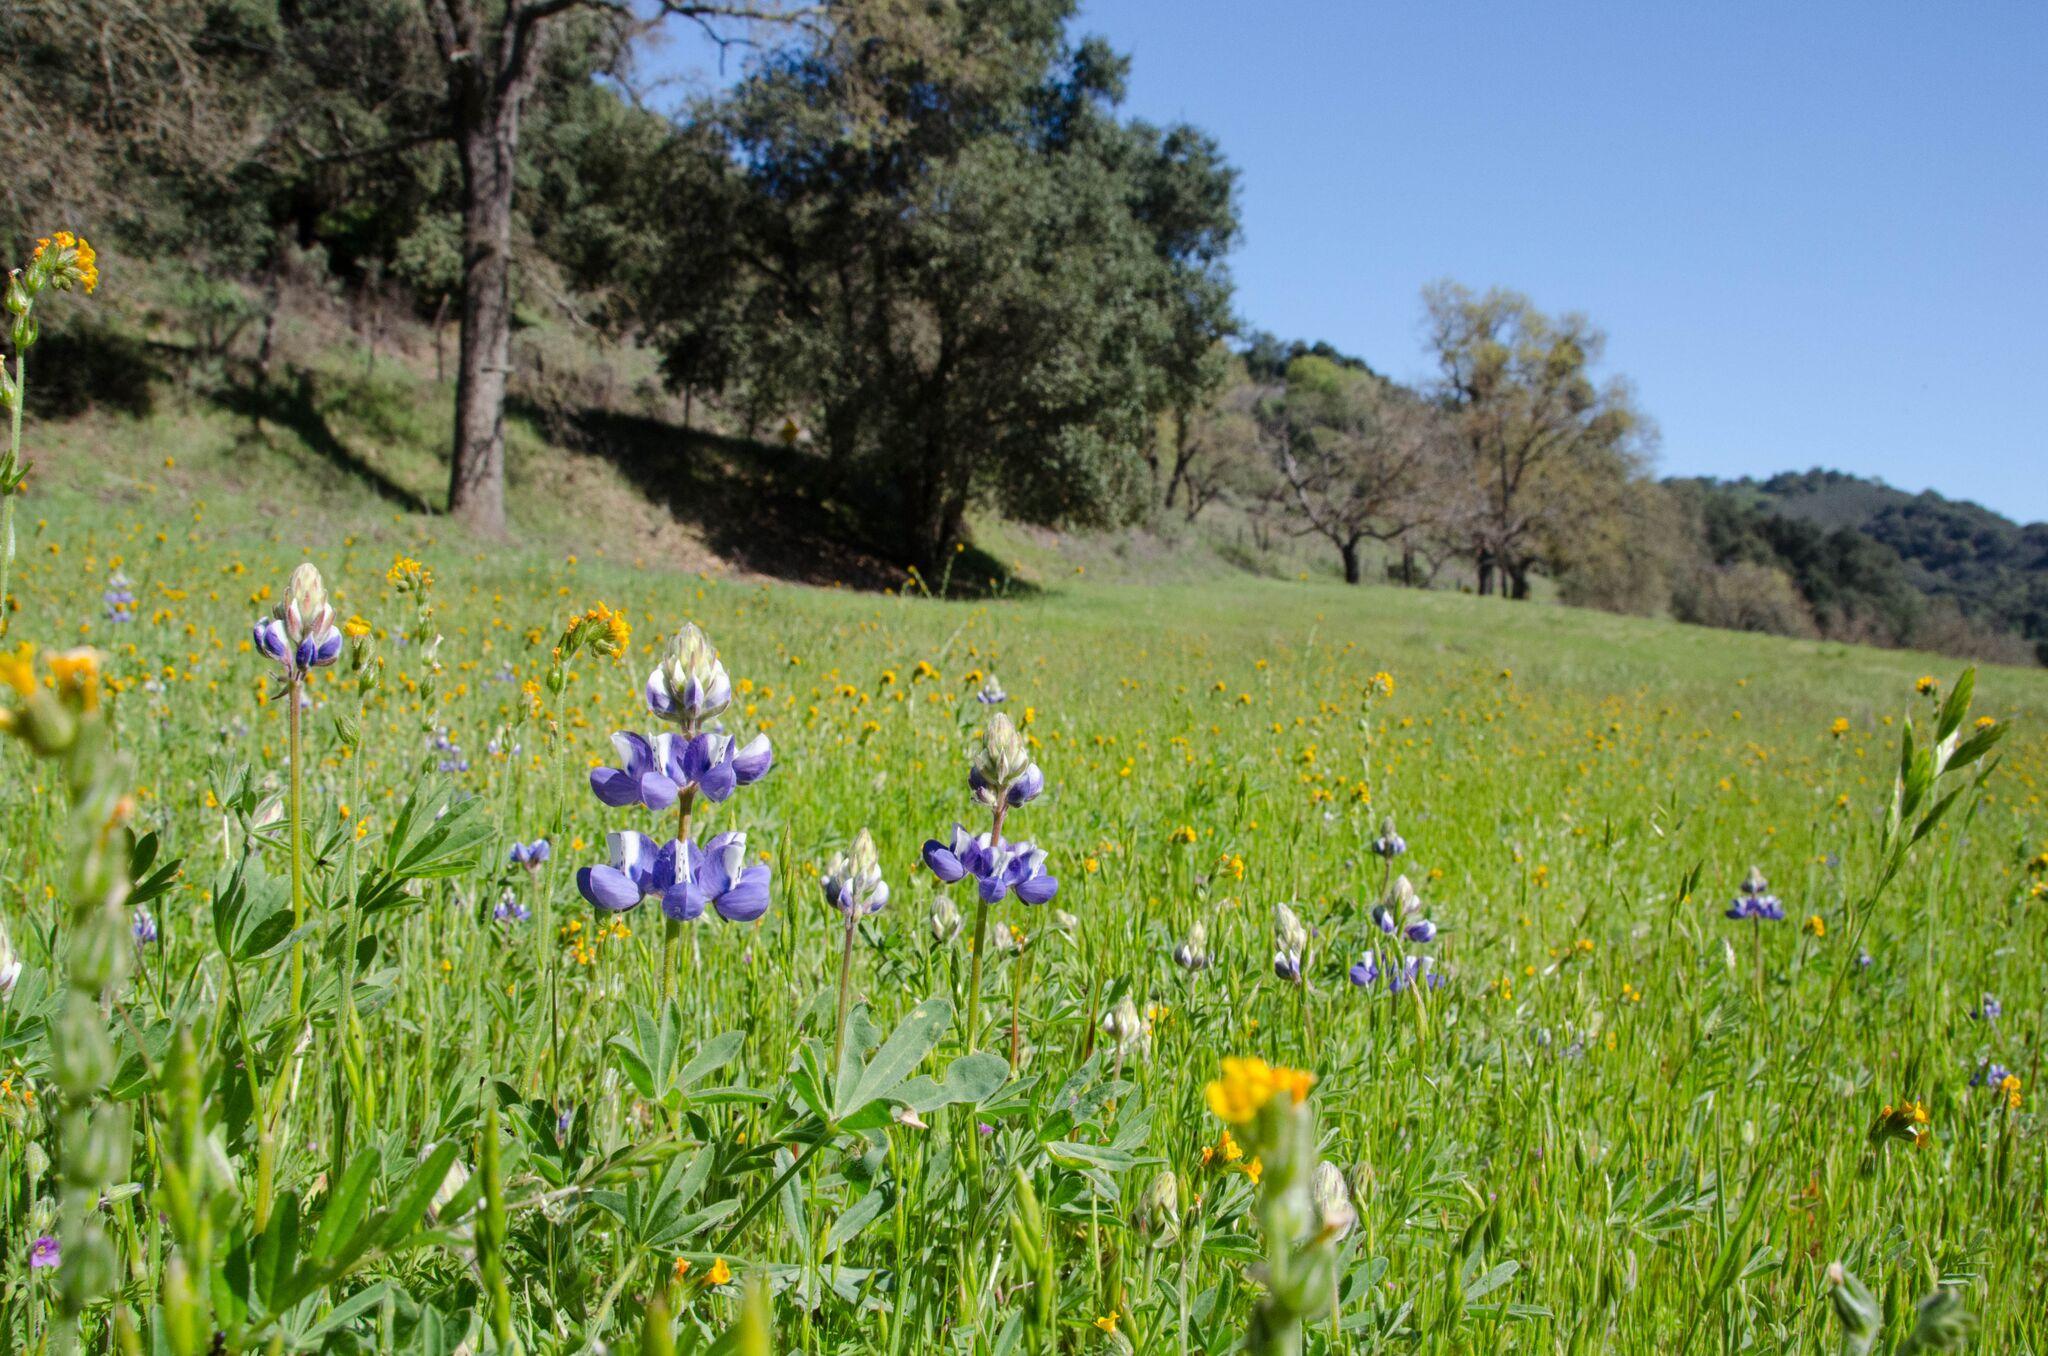 Llagas-Creek-Loop-Trail_Rancho-Canada-del-Oro-Open-Space-Preserve_Cassie-Kifer-6_preview